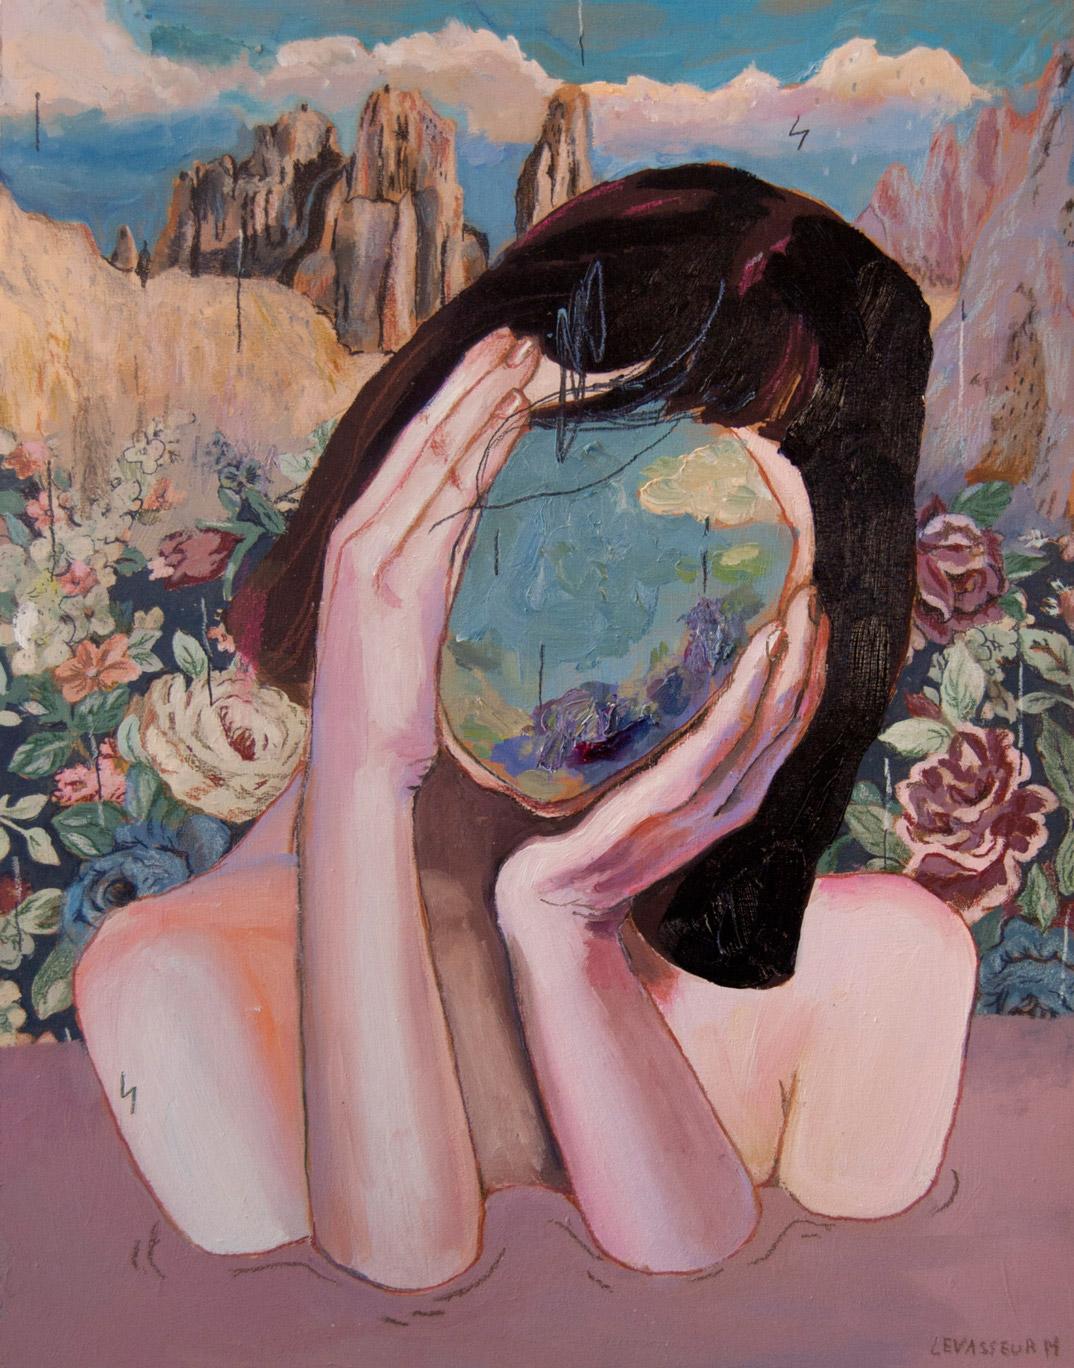 dipinyi-surreali-donne-alexandra-levasseur-06